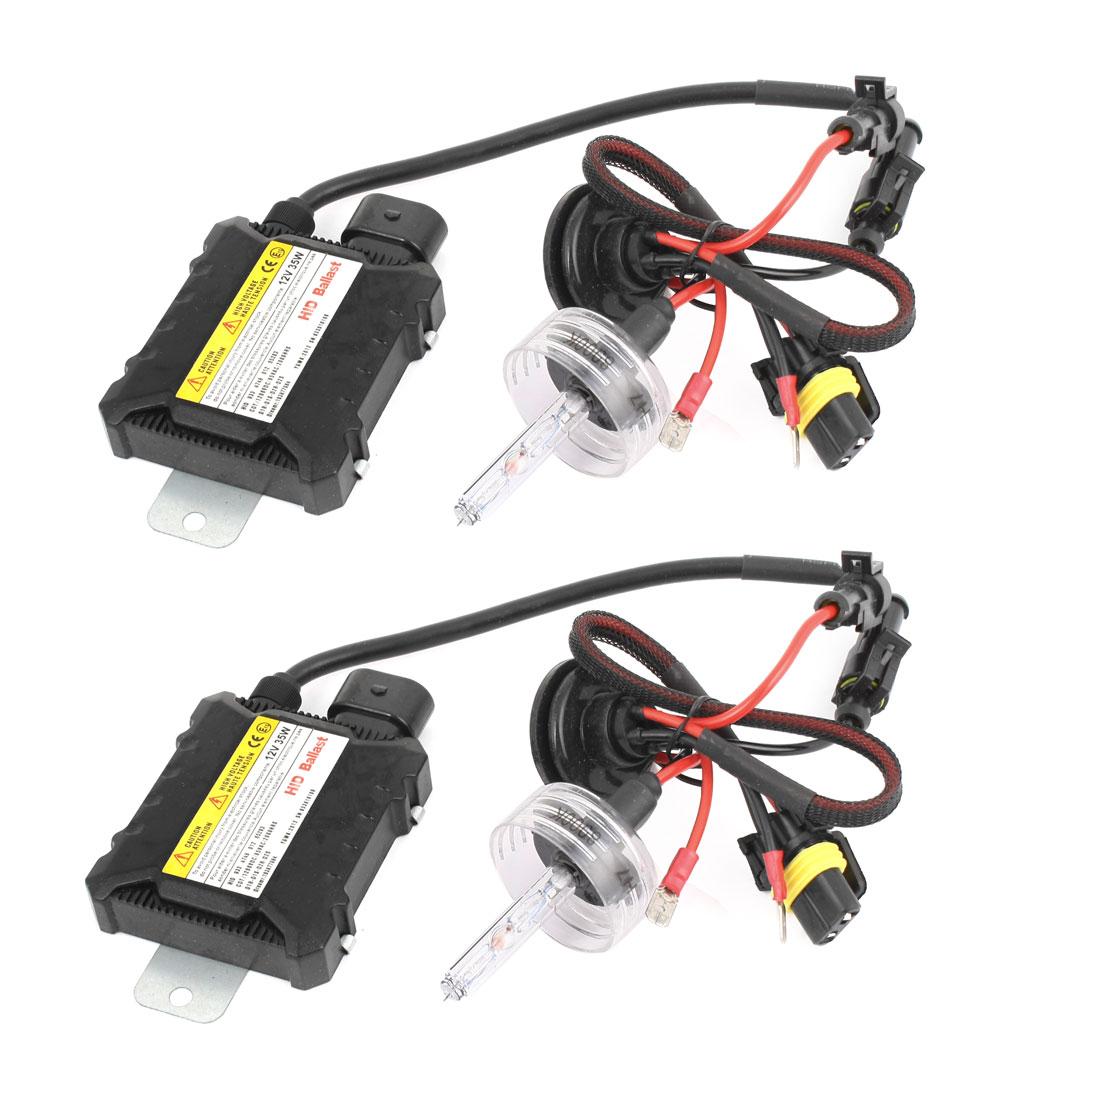 35W Car HID Kit Slim Ballasts H7 High/Low Bulbs 8000K White Xenon HeadLight 35W 12V